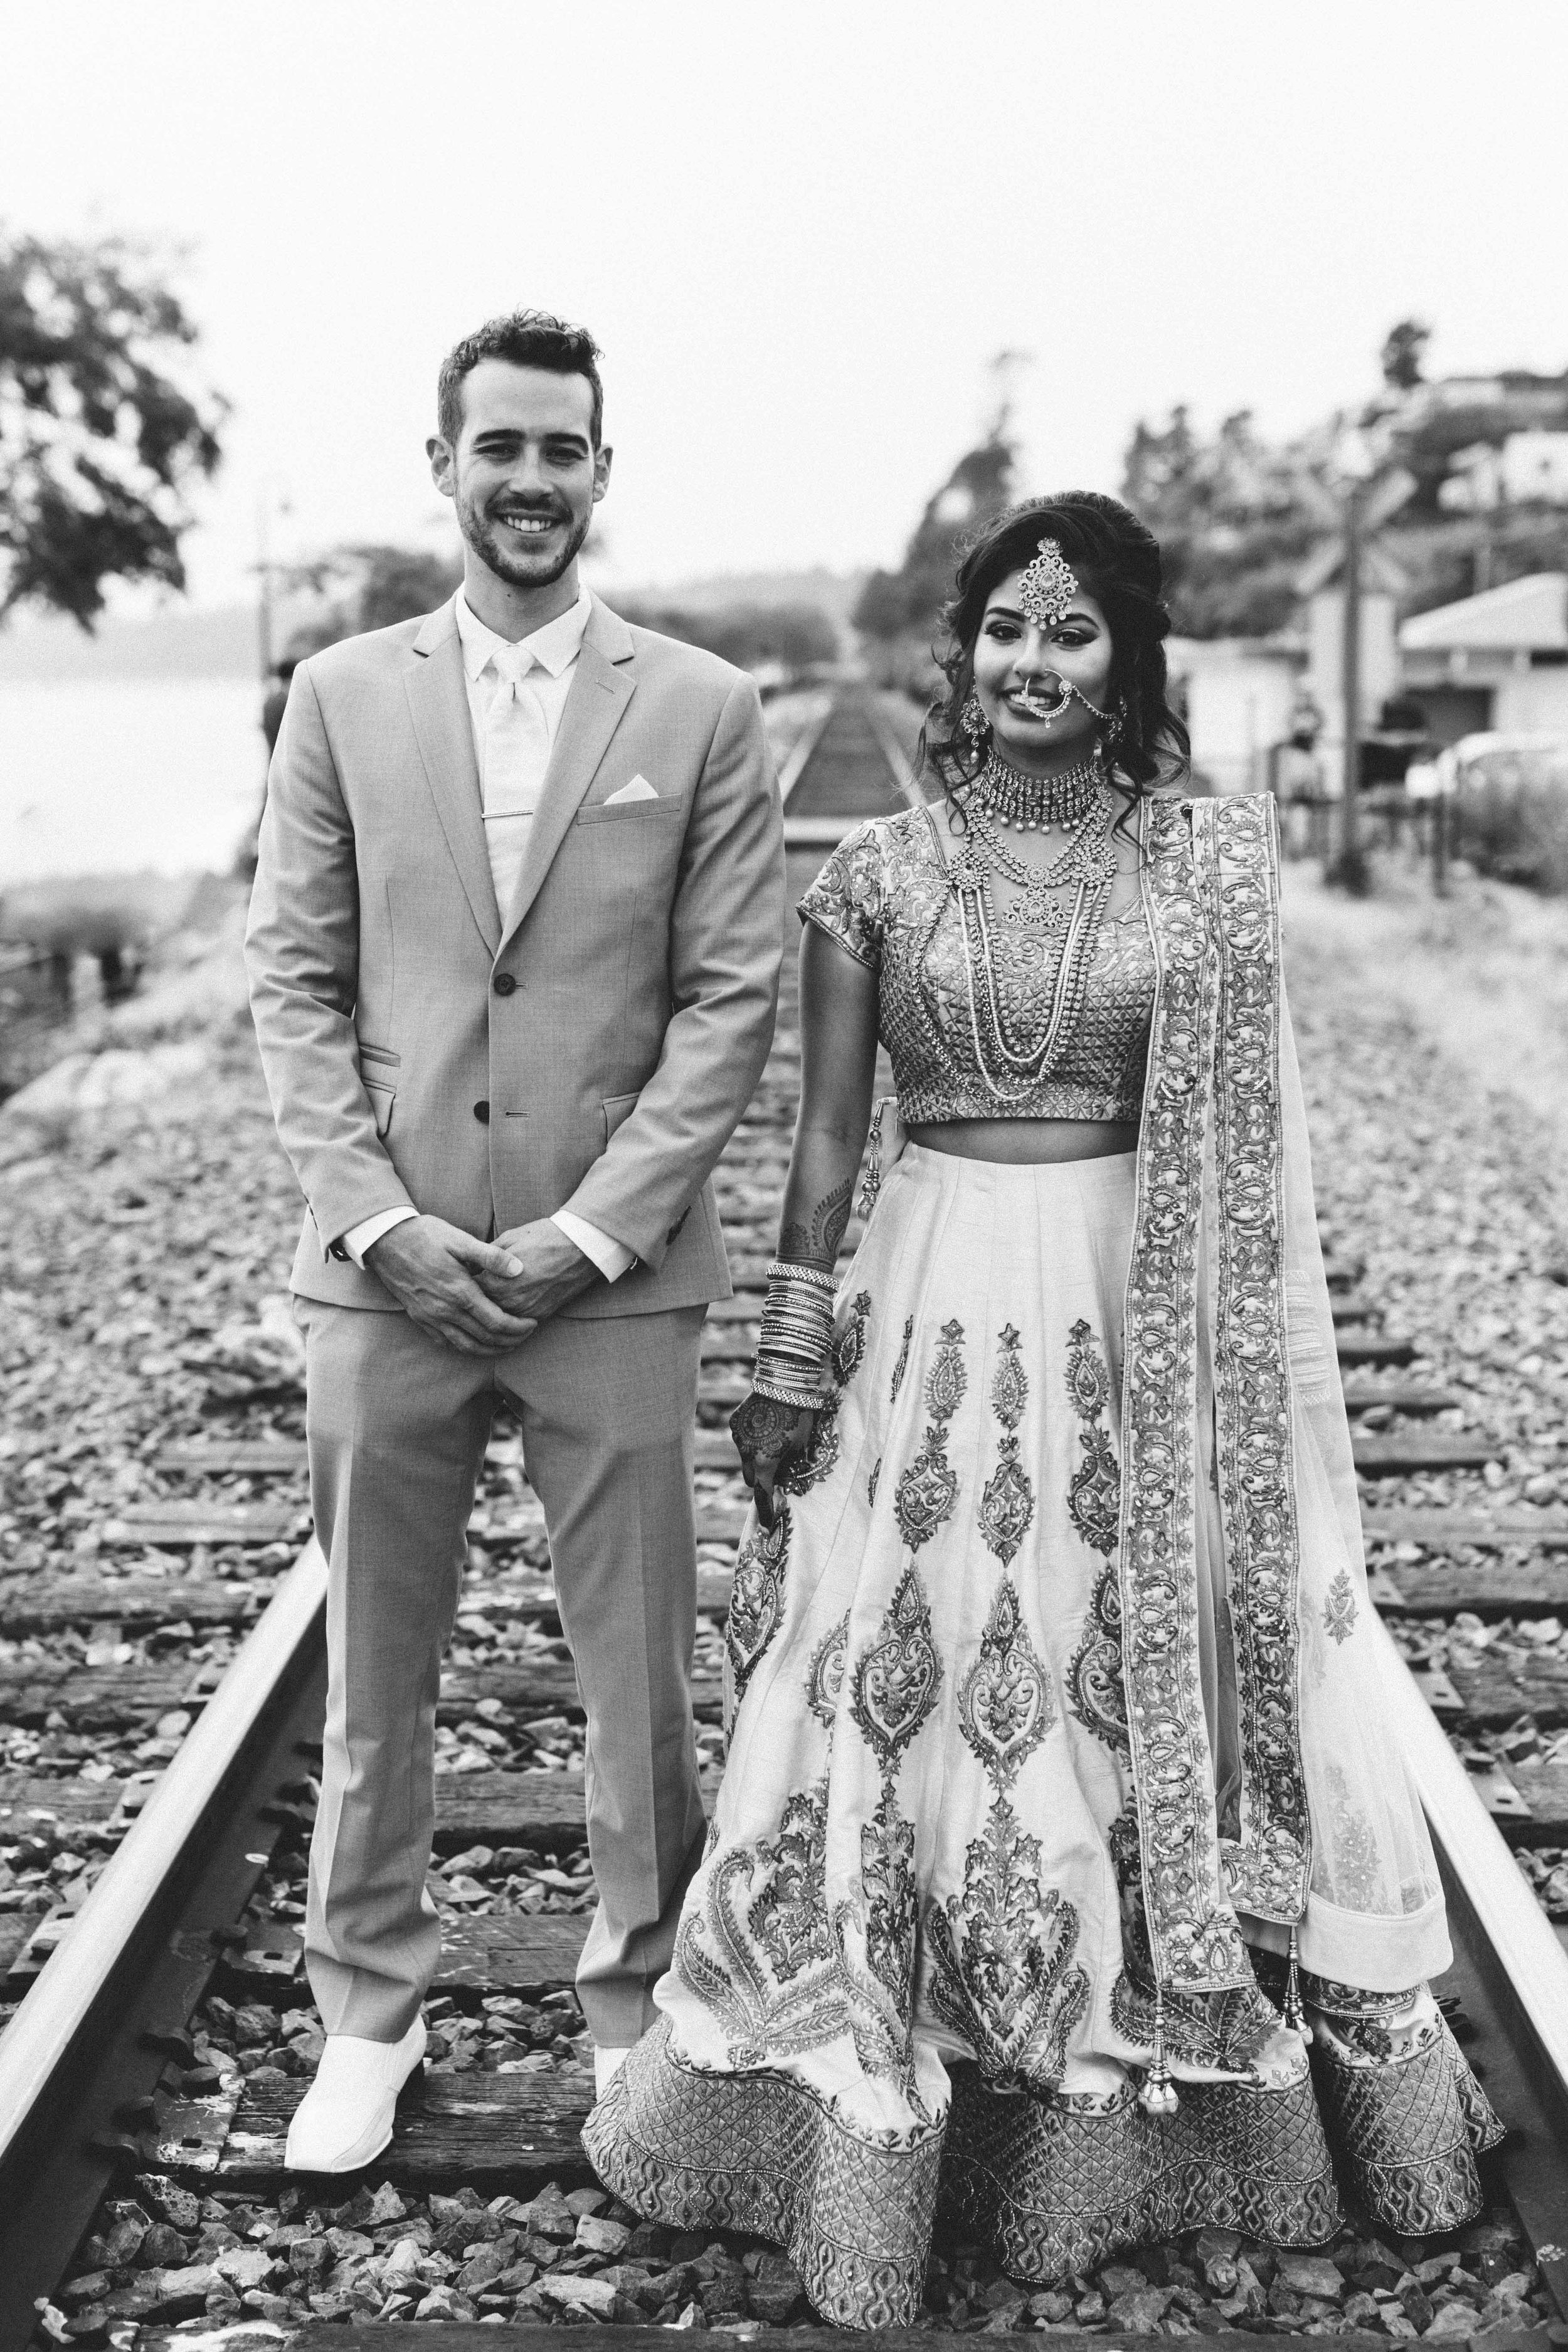 persian wedding couple photography videography vancouver bc.jpg